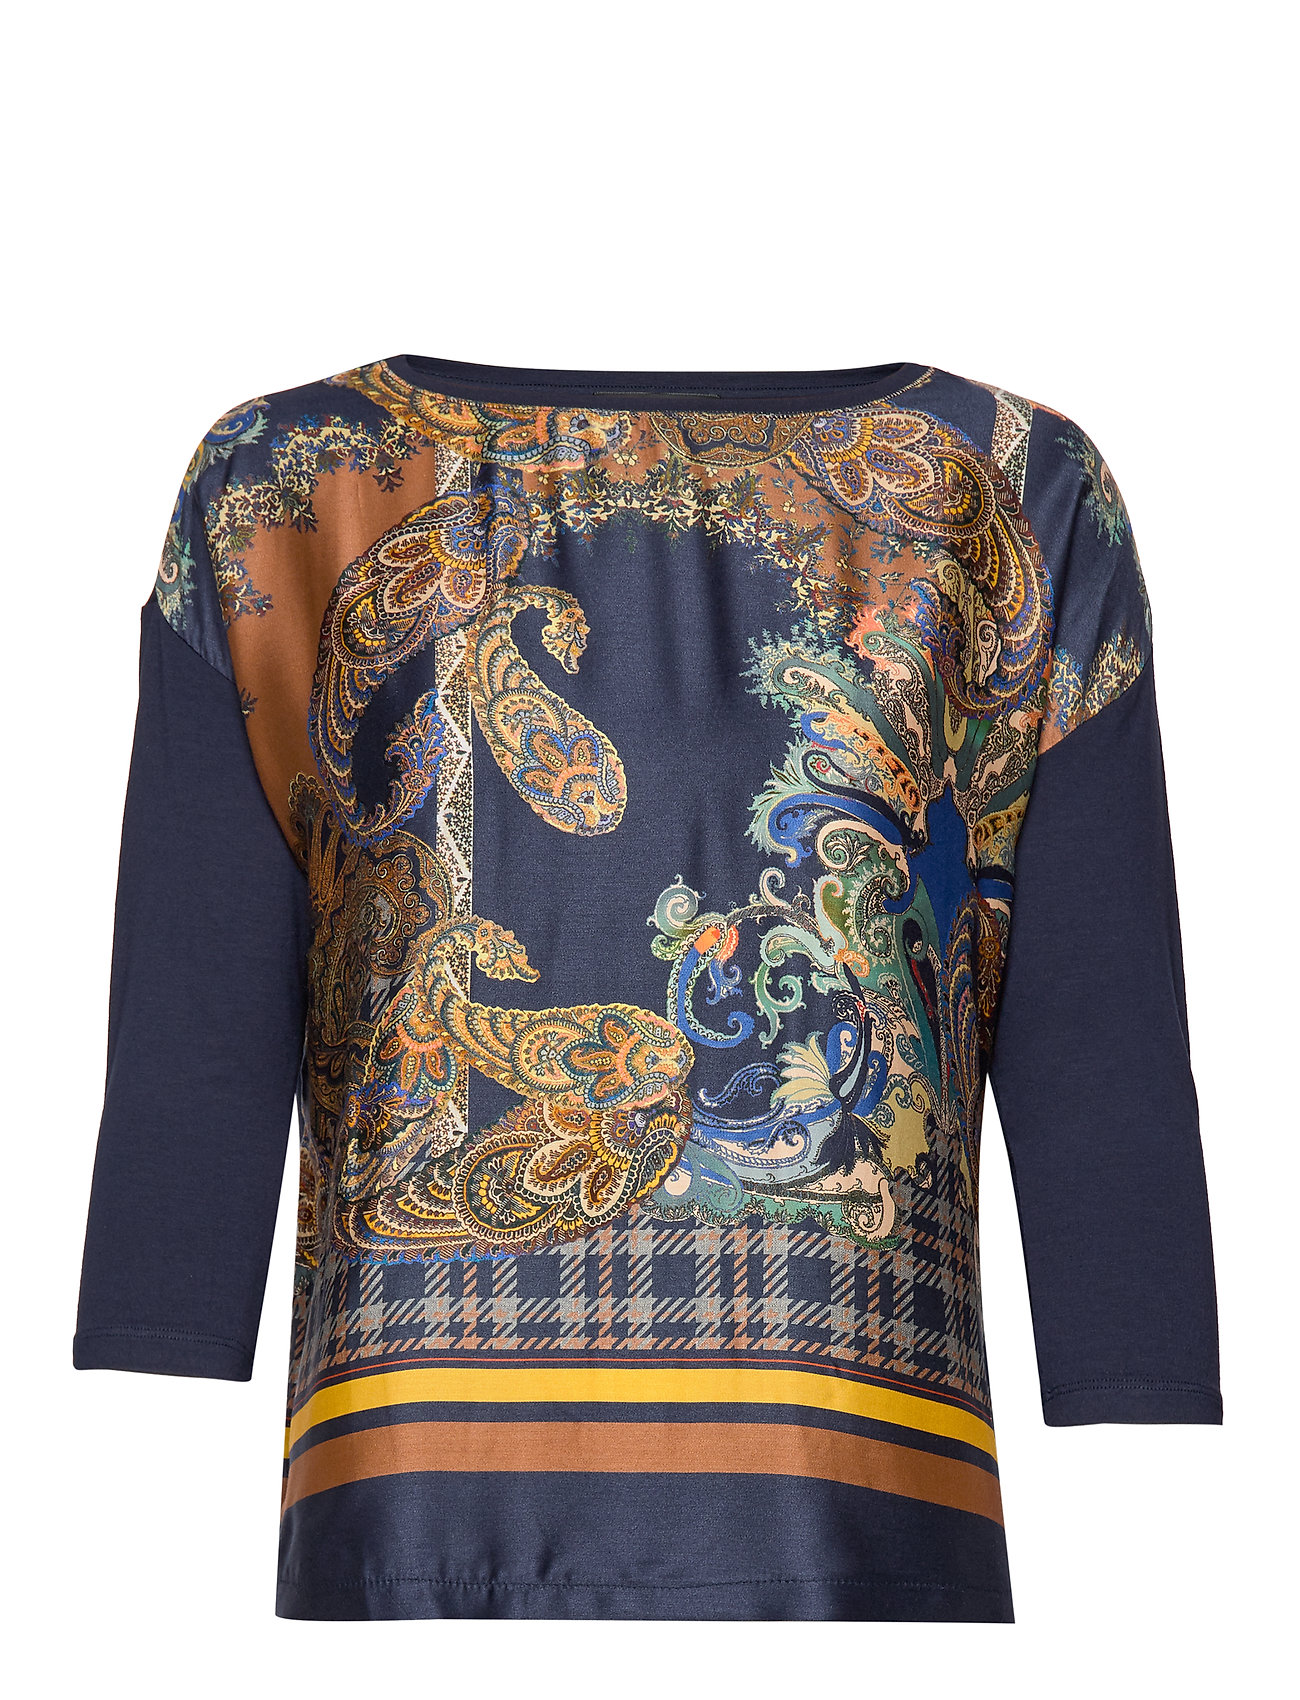 Betty Barclay Shirt Long 3/4 Sleeve - DARK BLUE/BROWN